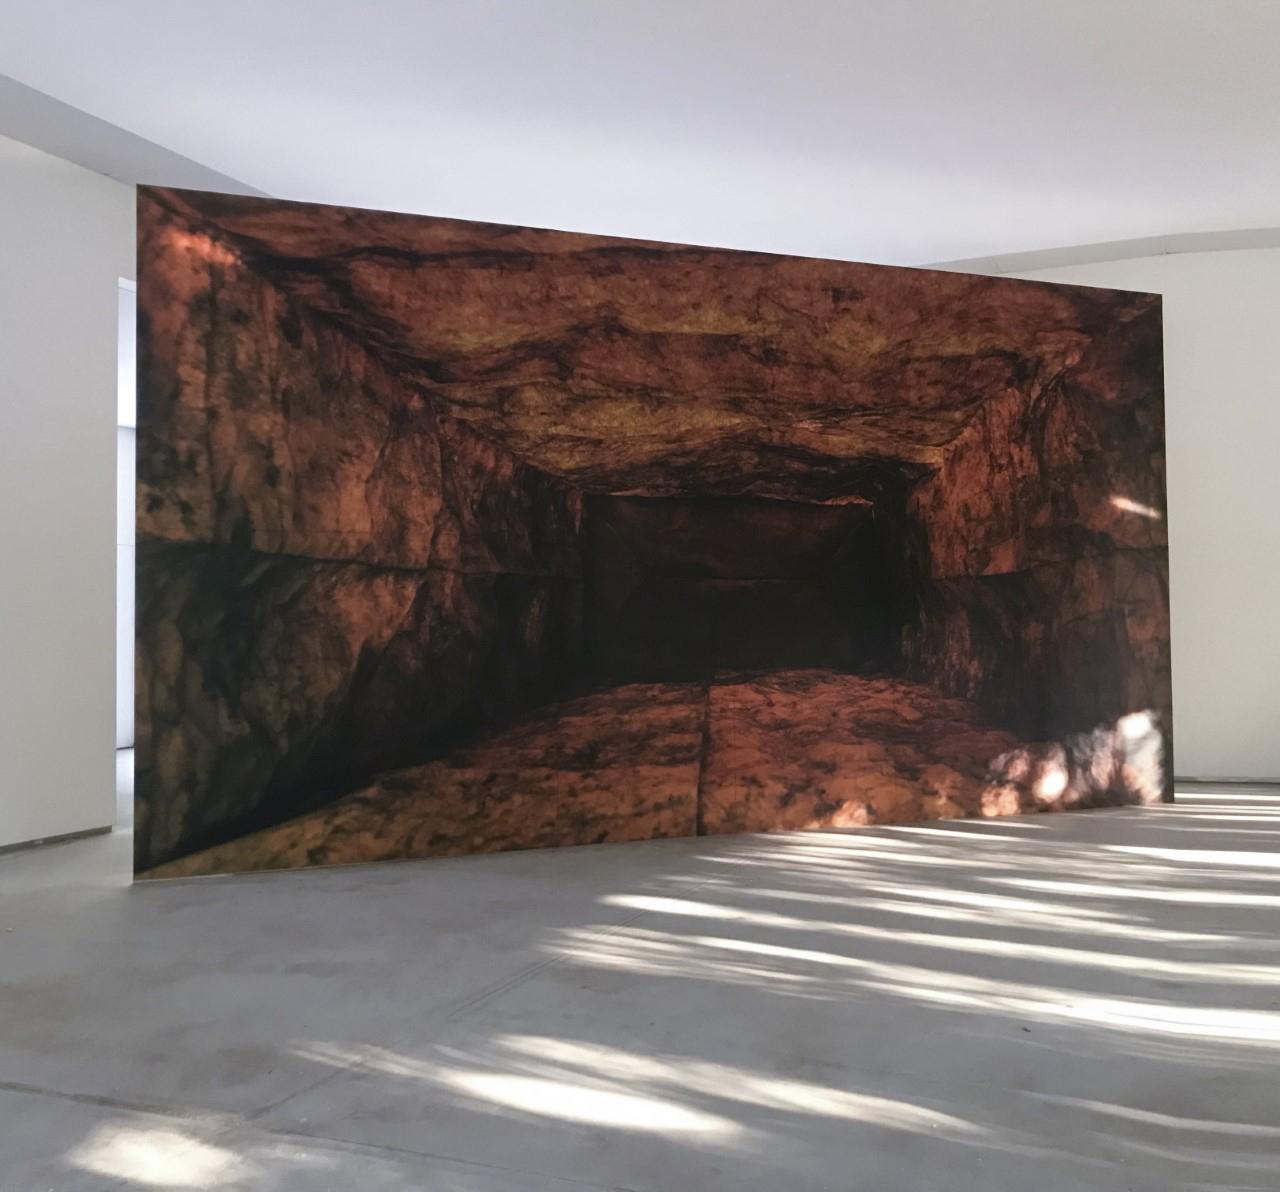 PROPAGANDA, 2021, Lucia Koch. obra instalada na Galeria Praça, no Instituto Inhotim